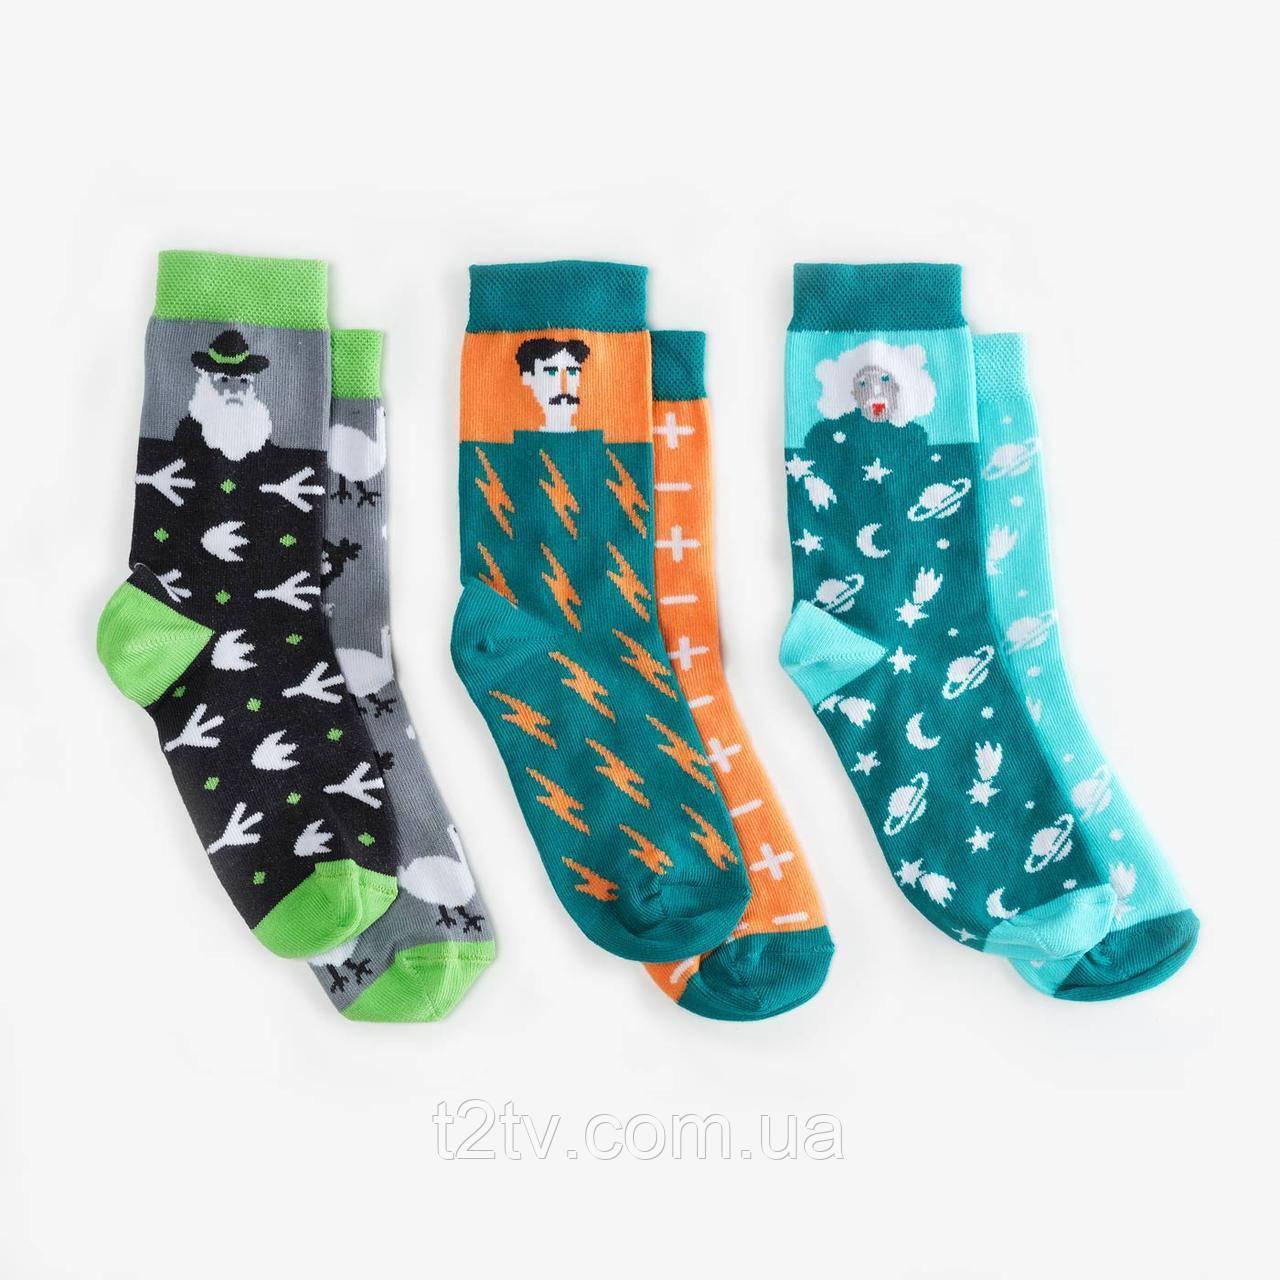 Носки детские Dodo Socks набор Kunsht 2-3 года